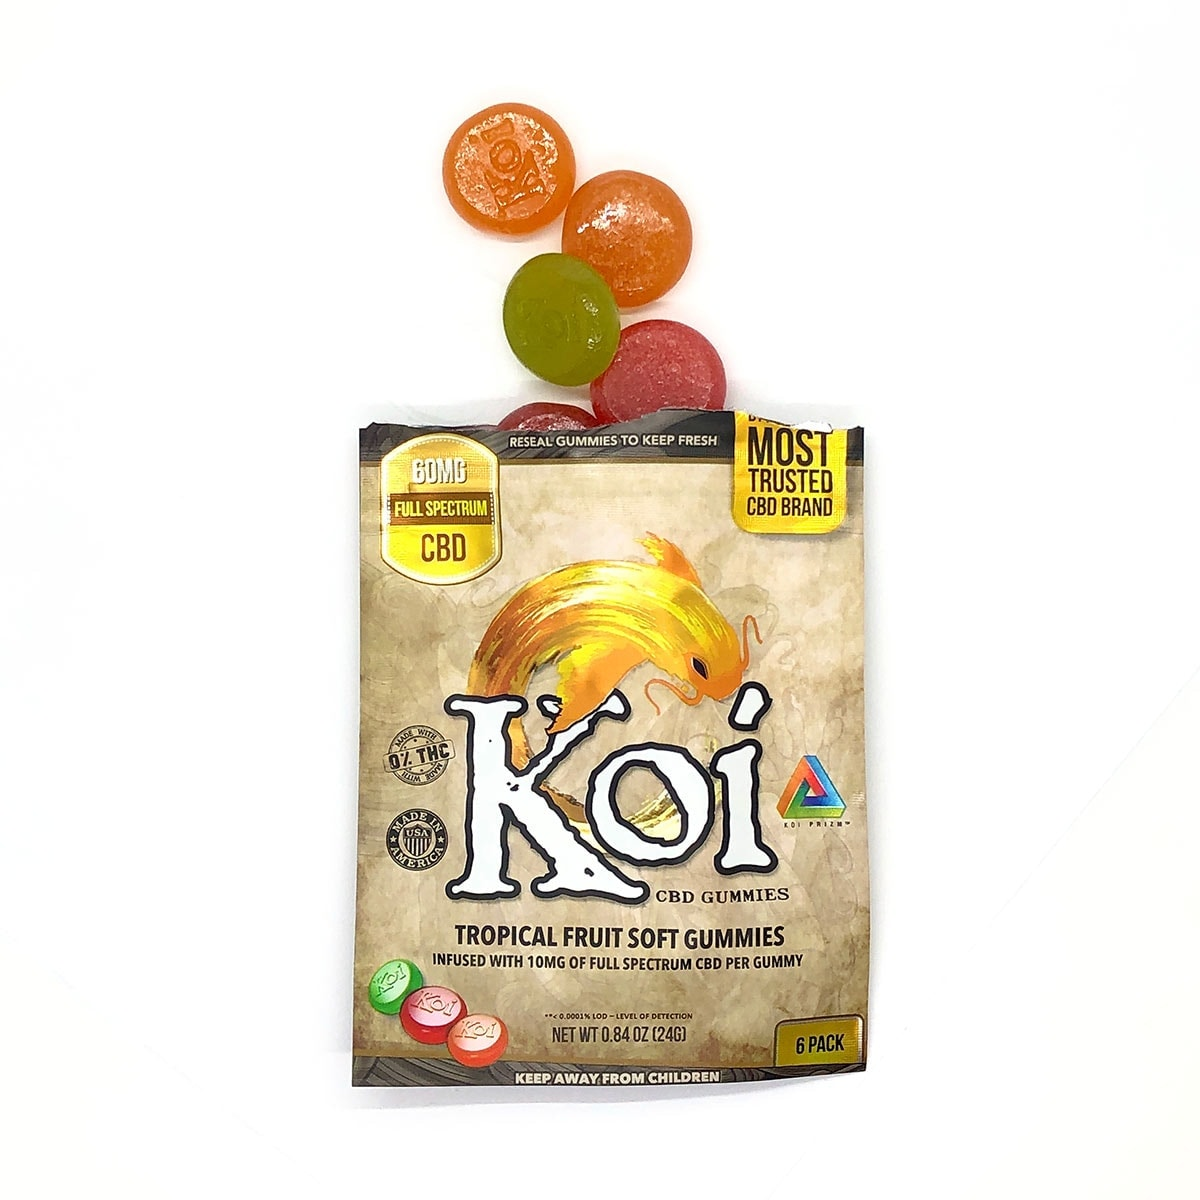 Koi-CBD,-CBD-Gummies,-Tropical-Fruit,-6-count,-60mg-of-CBD_Front